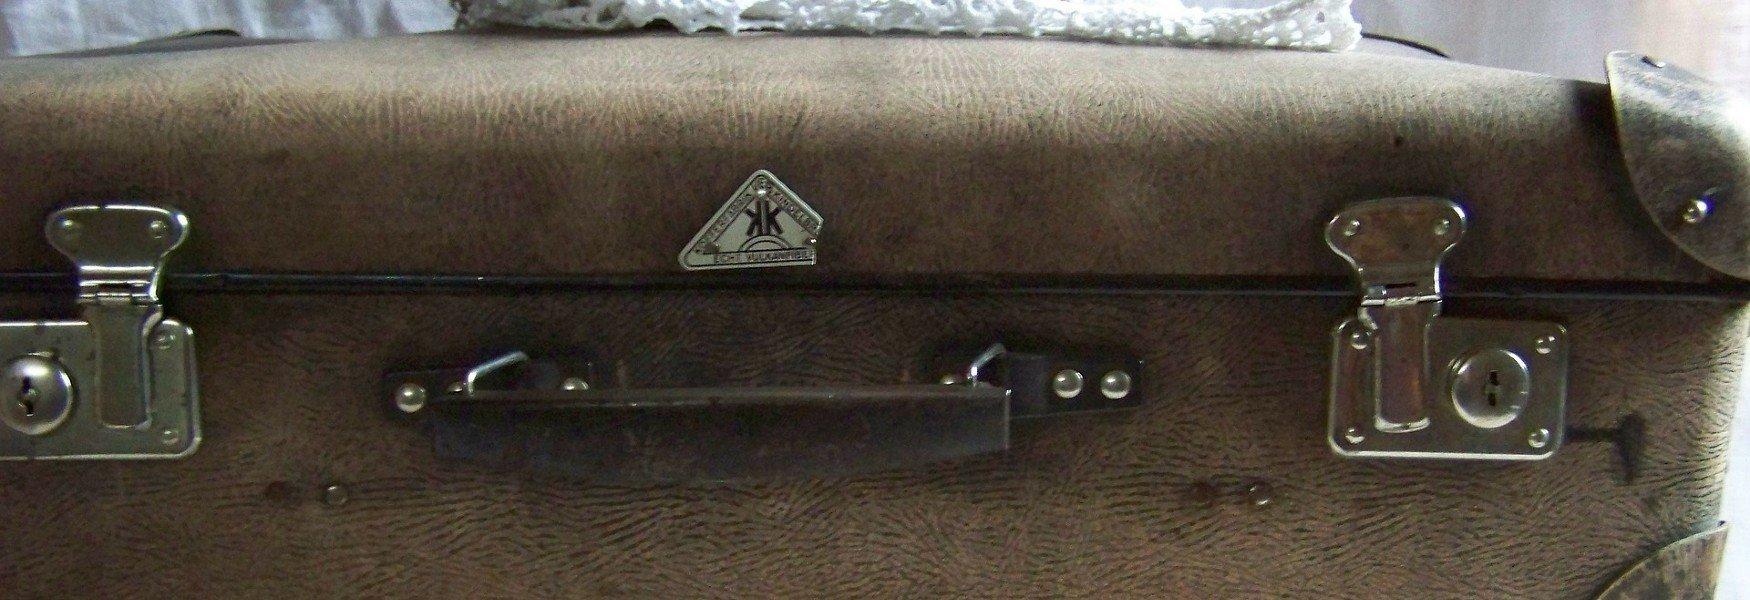 Zware Koffer